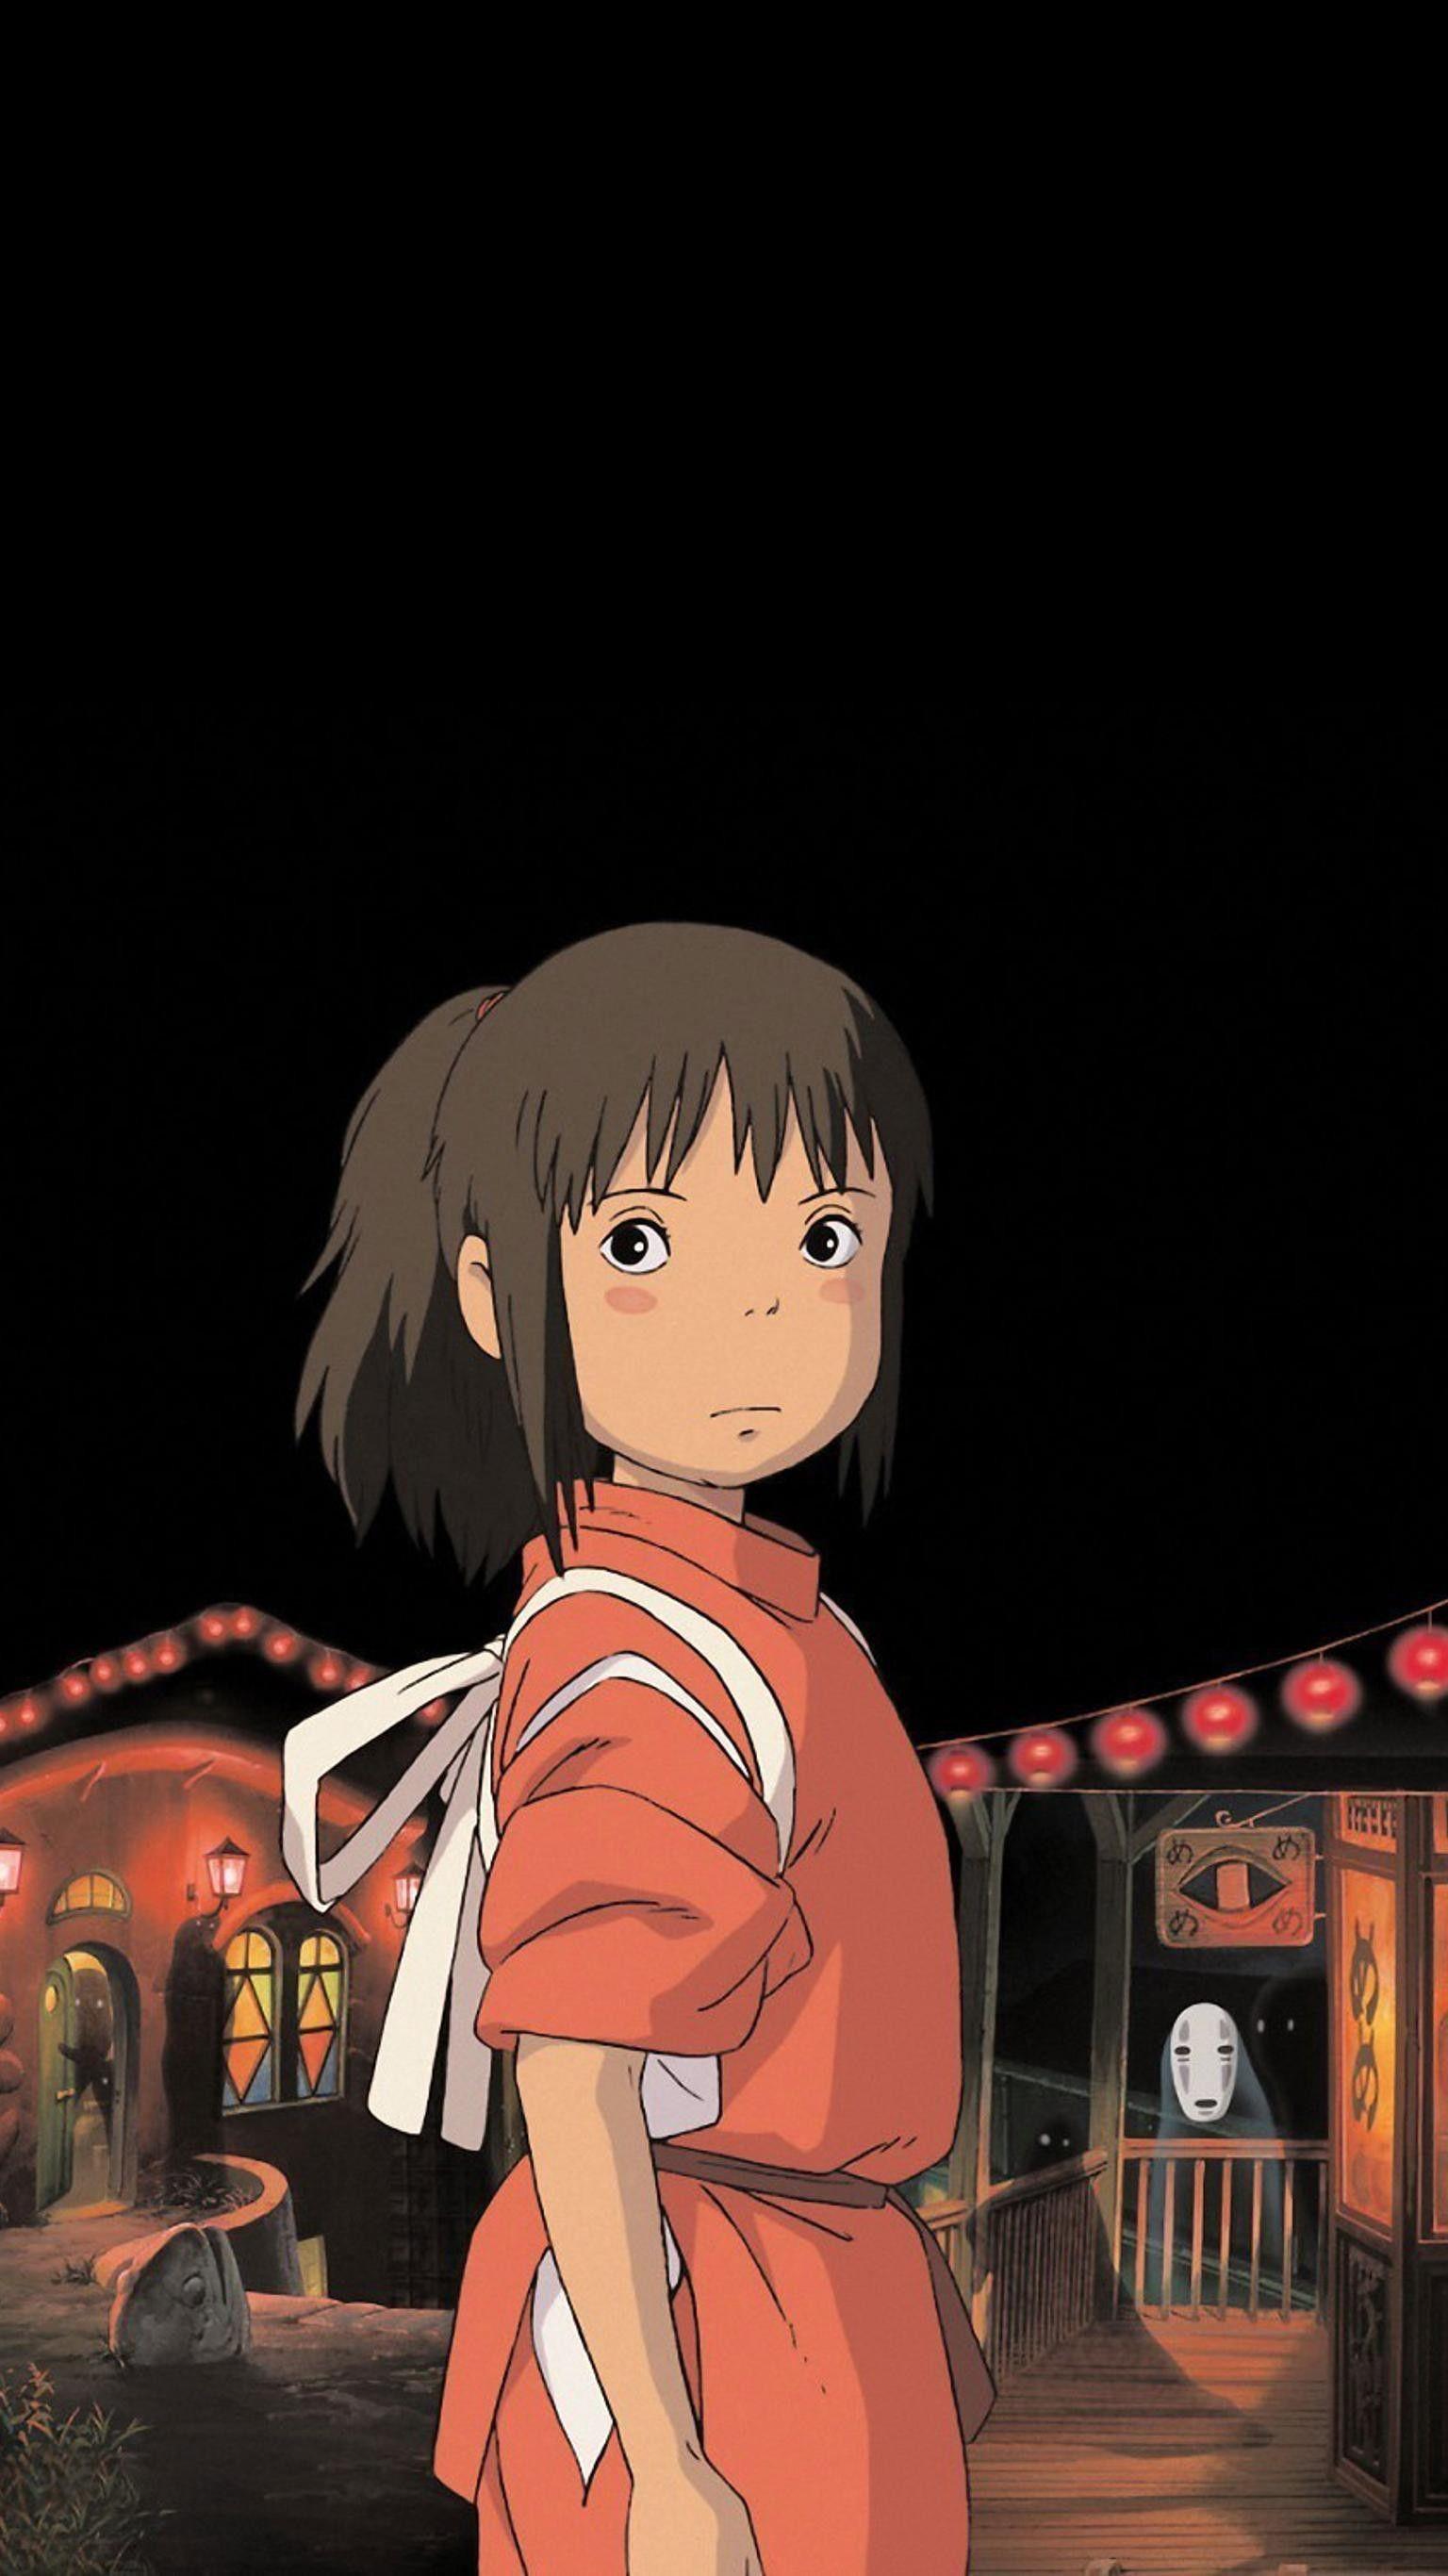 Res 1536x2732 Wallpaper For Spirited Away In 2020 Ghibli Artwork Studio Ghibli Spirited Away Anime Films